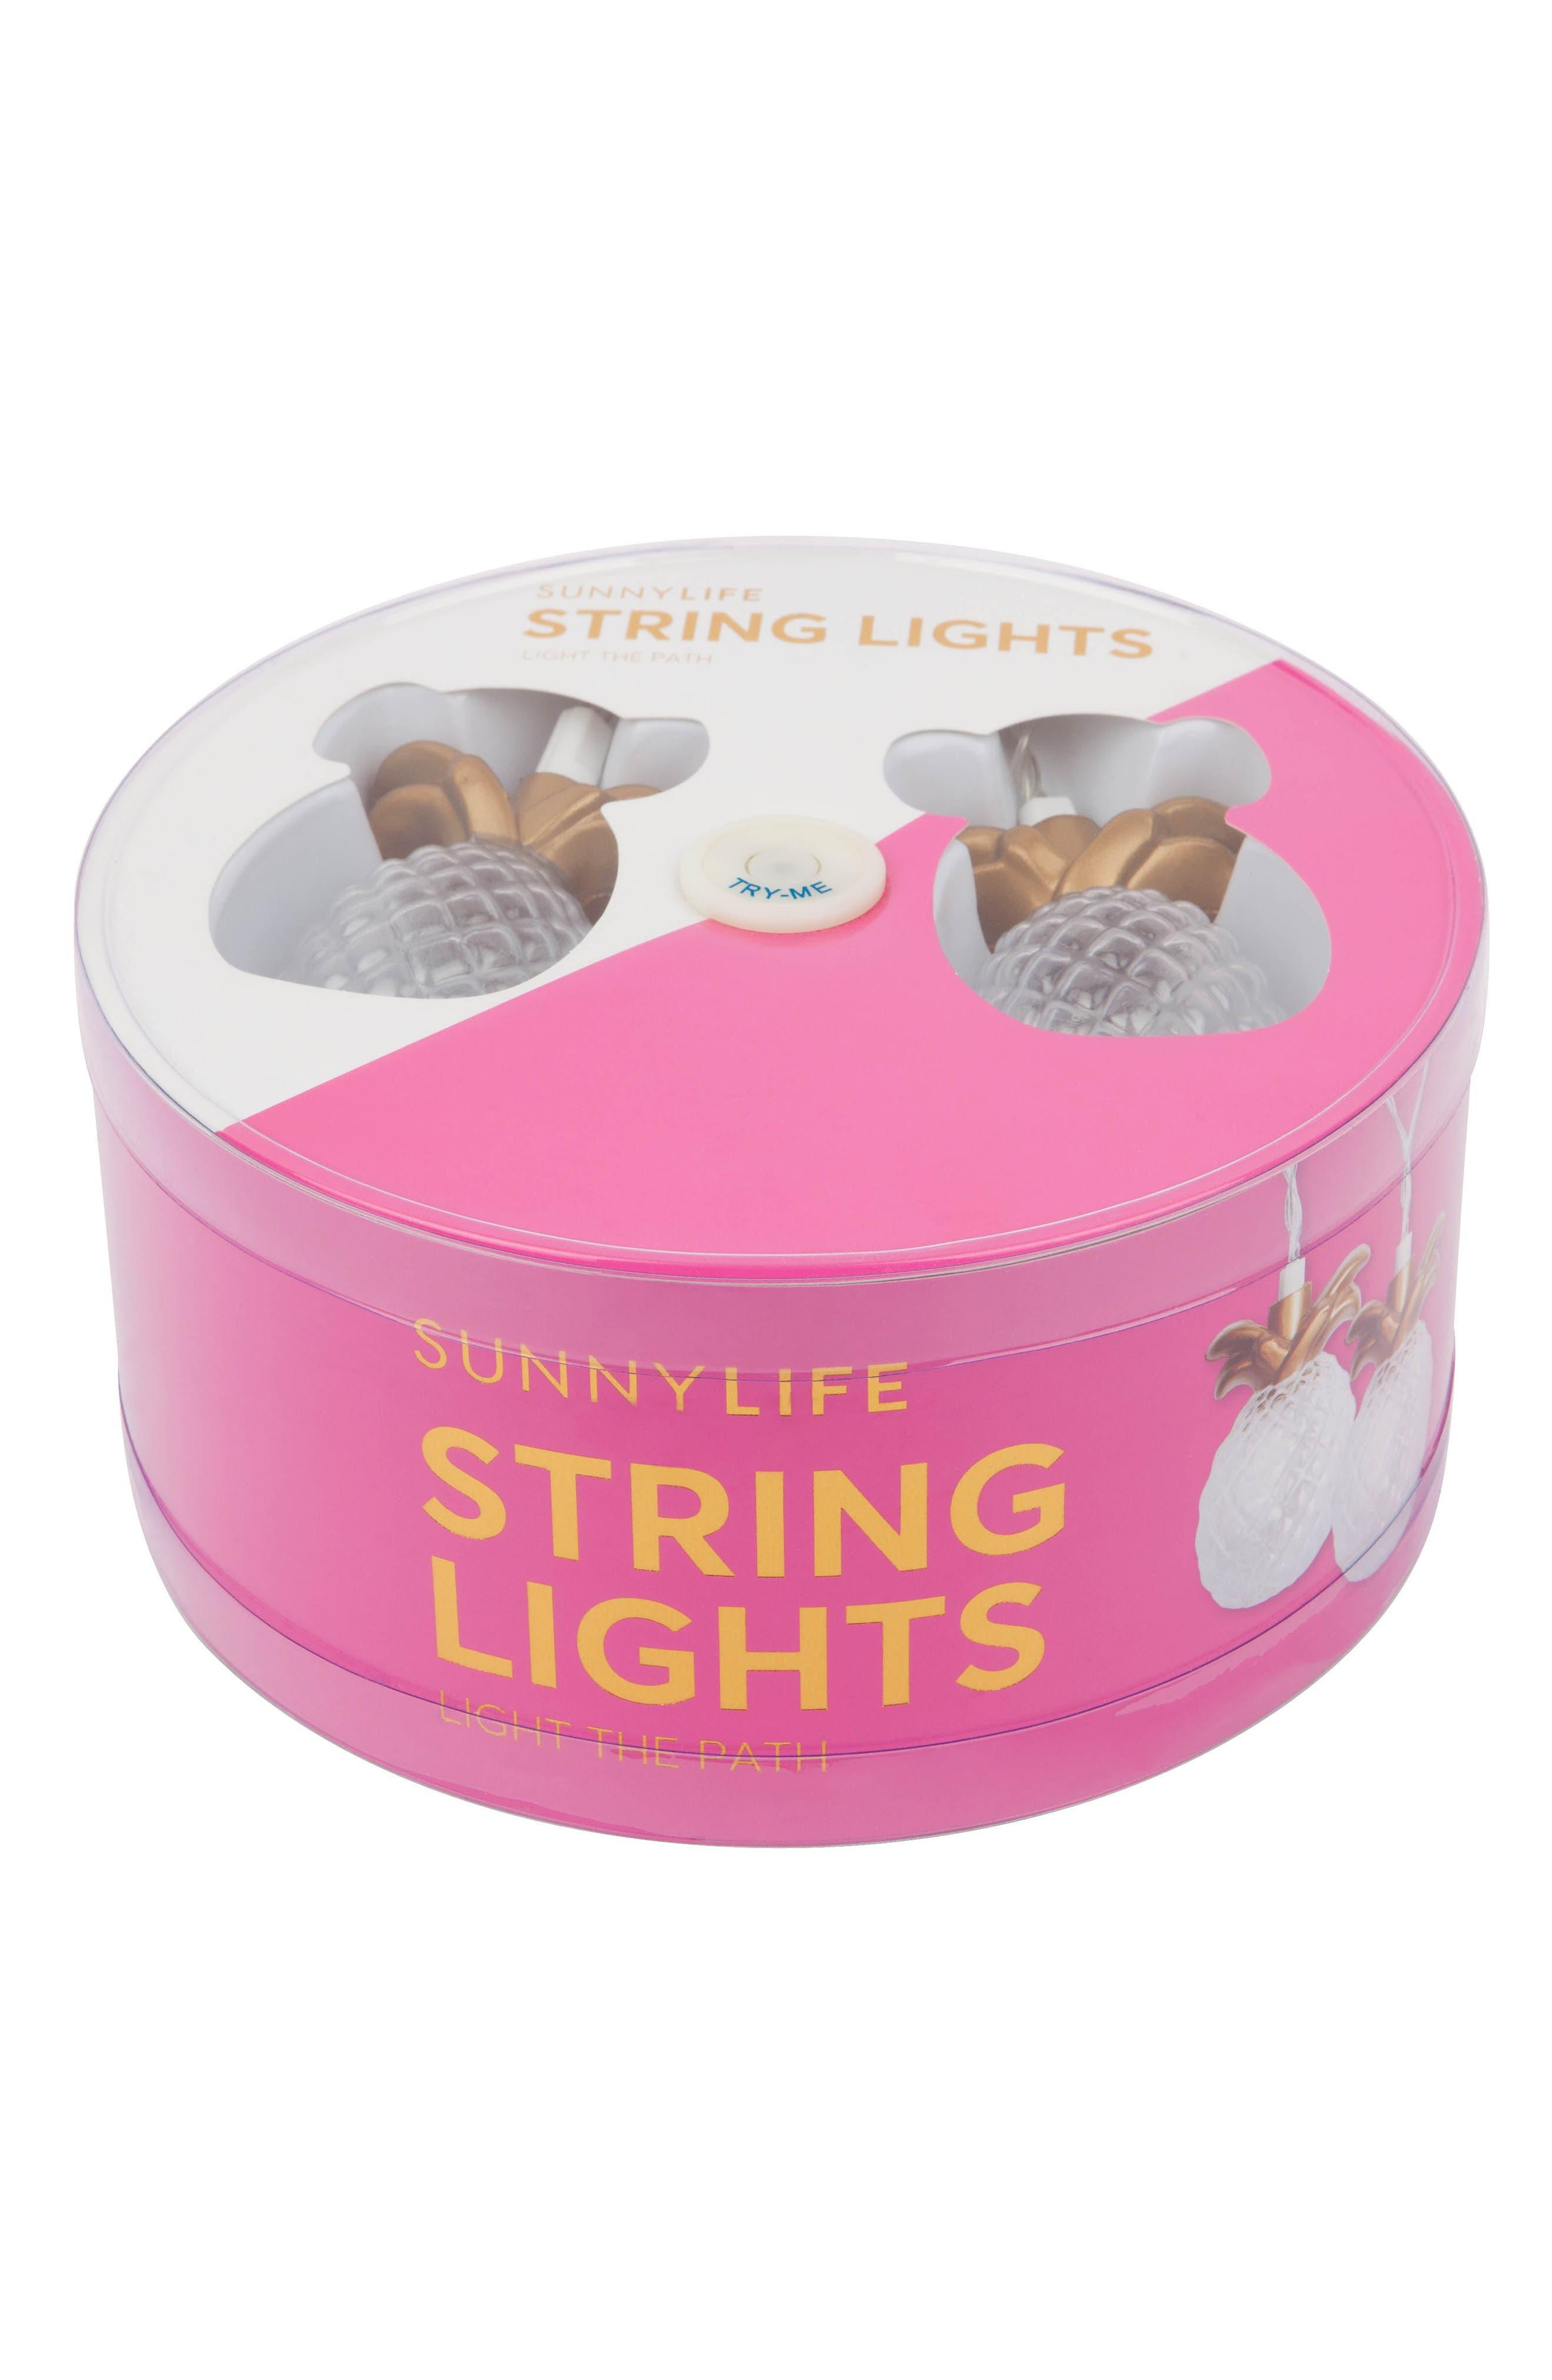 Sunnylife Gold Pineapple String Lights